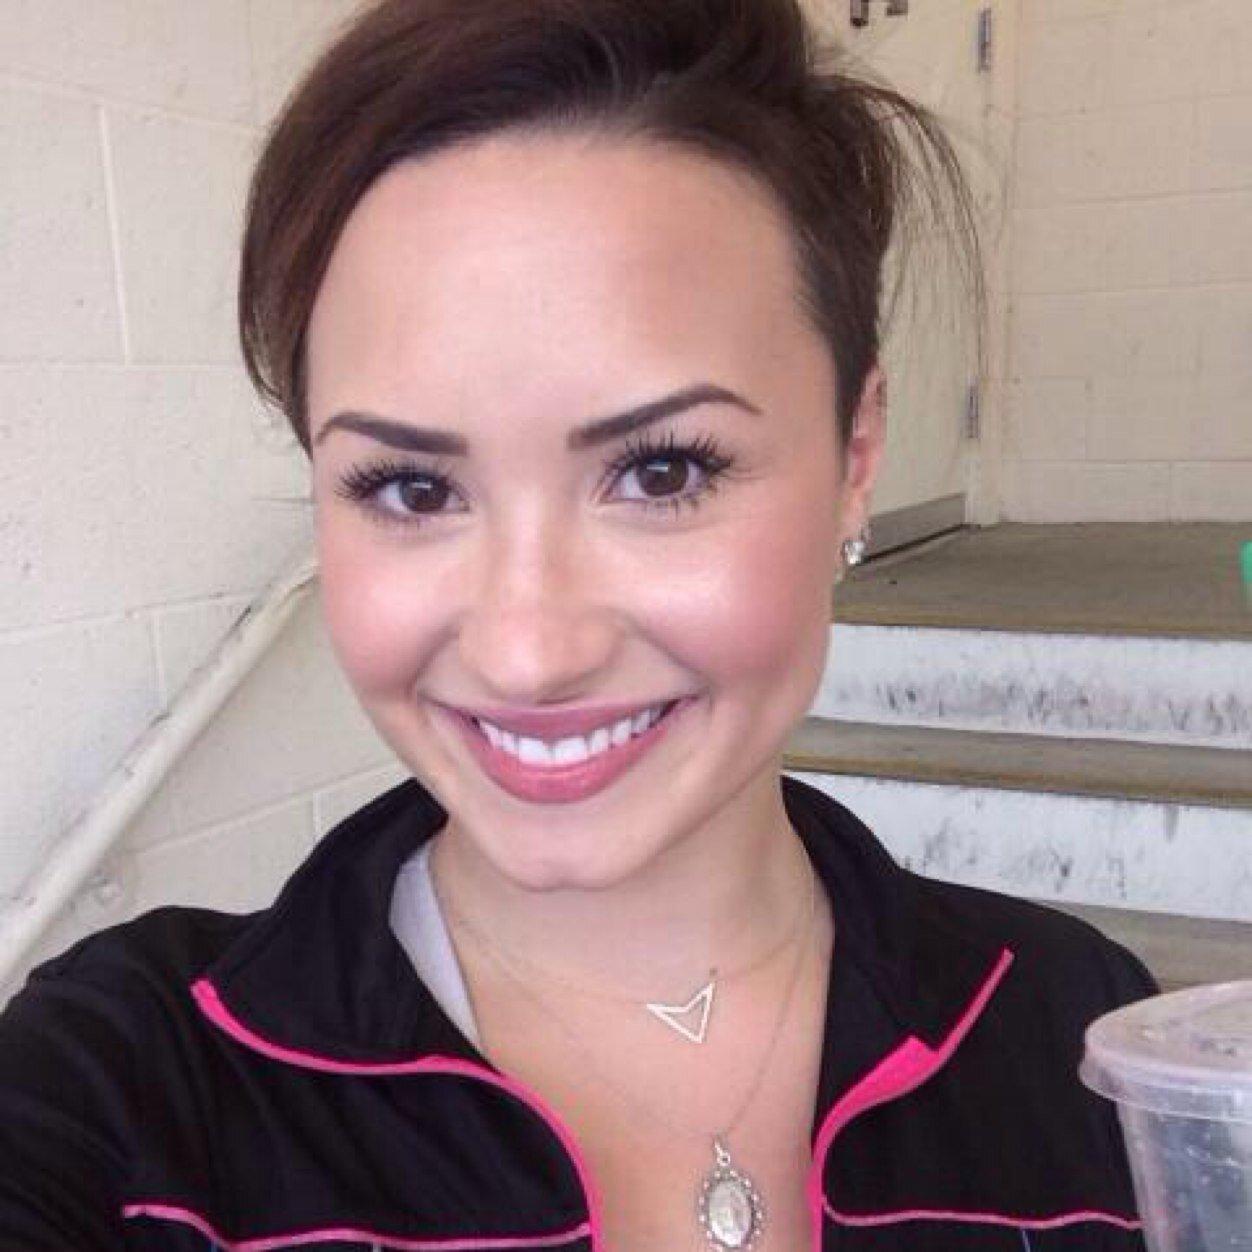 Twitter Demetria Lovato nudes (47 images), Boobs